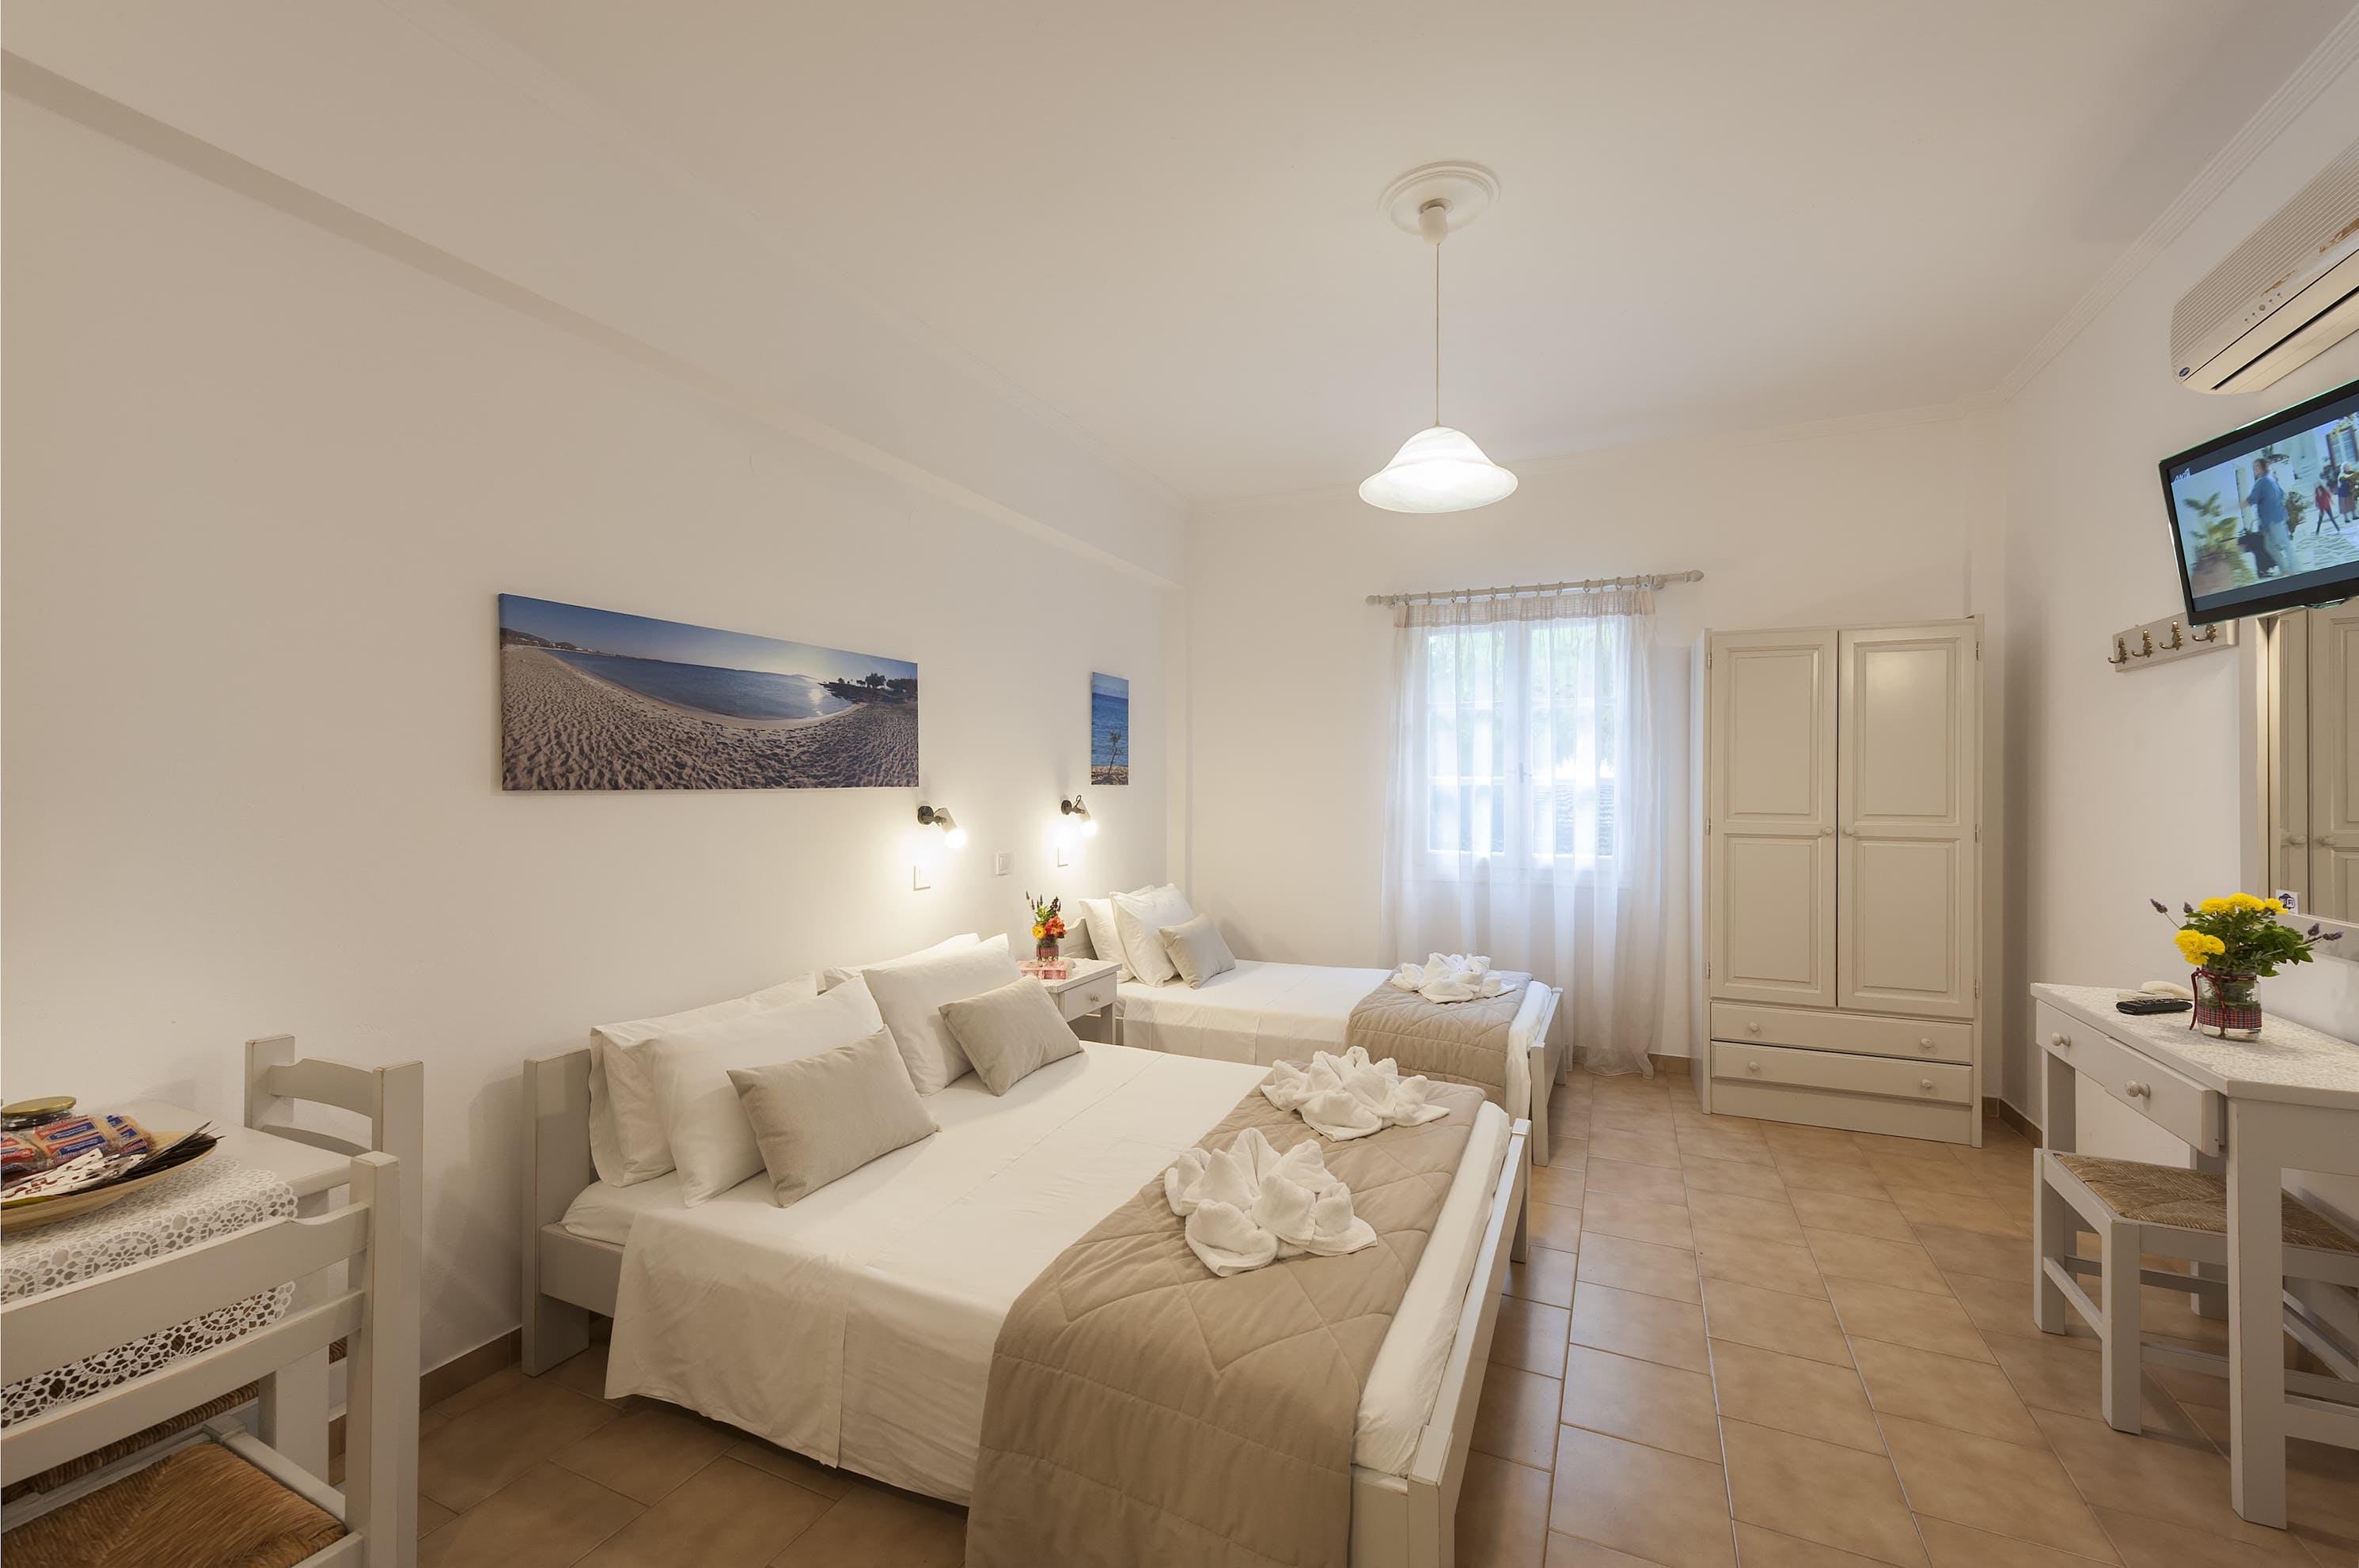 Triple room with terrace bedroom